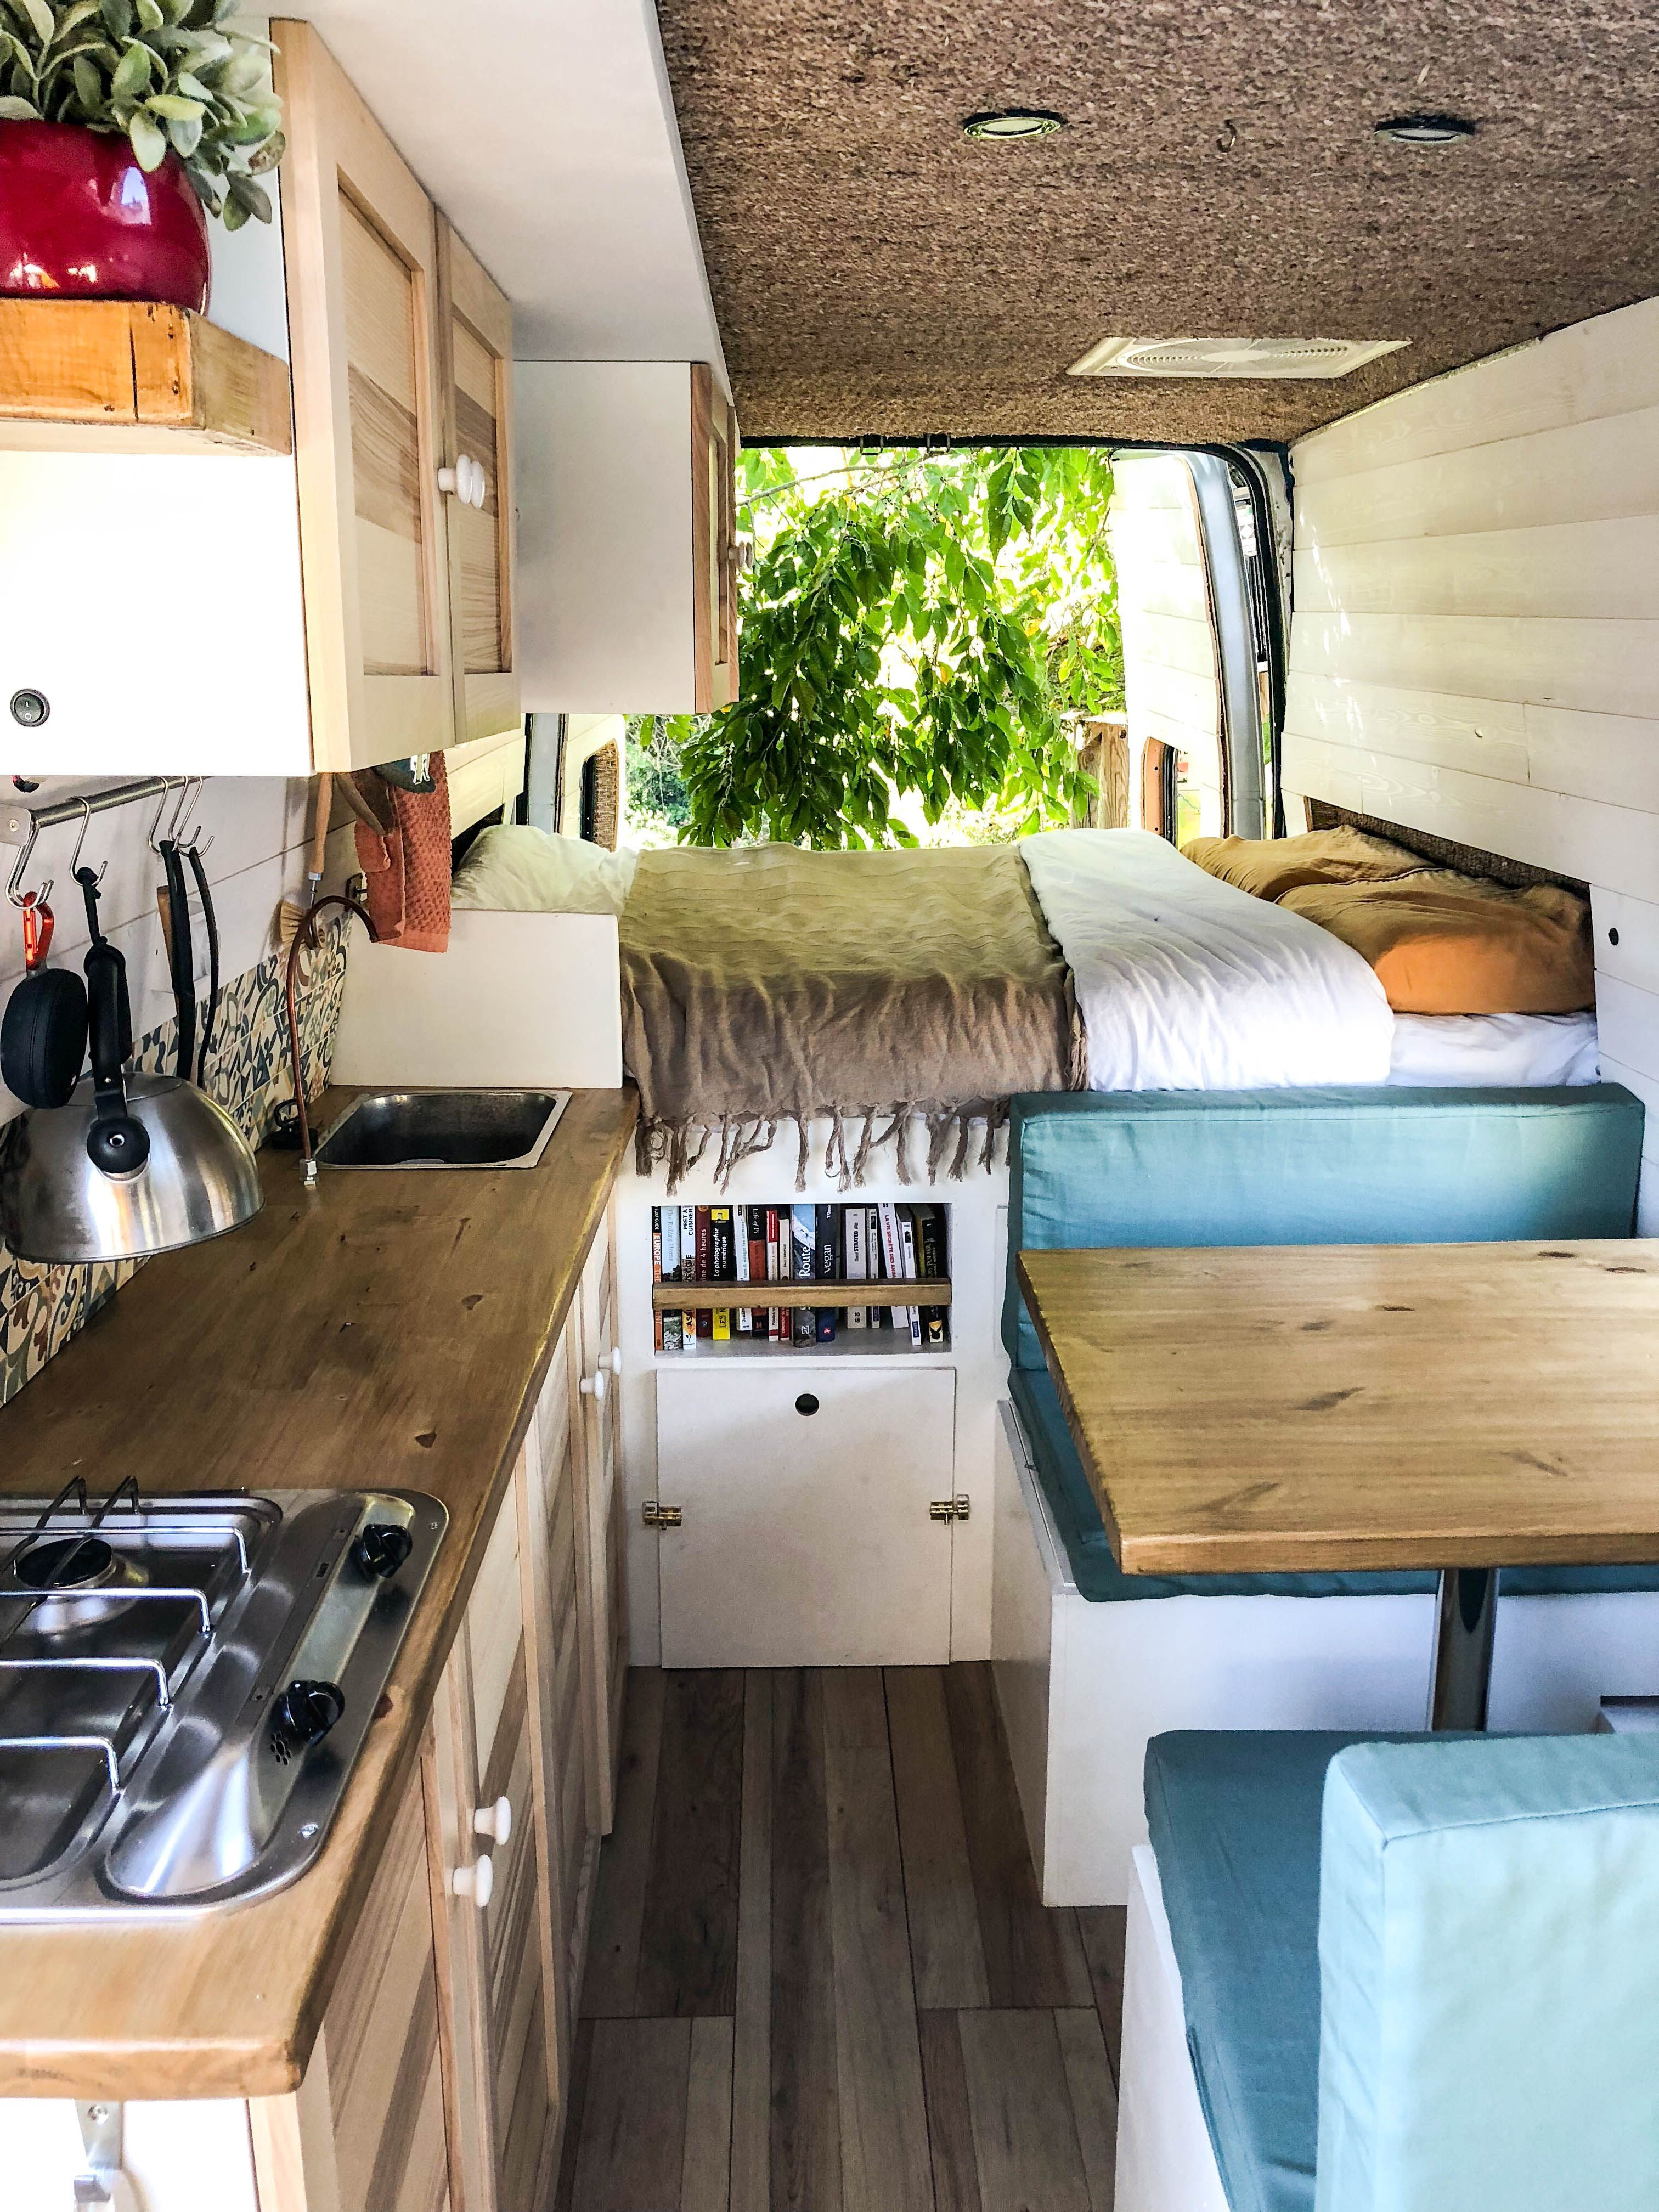 More information also creative campervan interior designs for your next van build rh pinterest